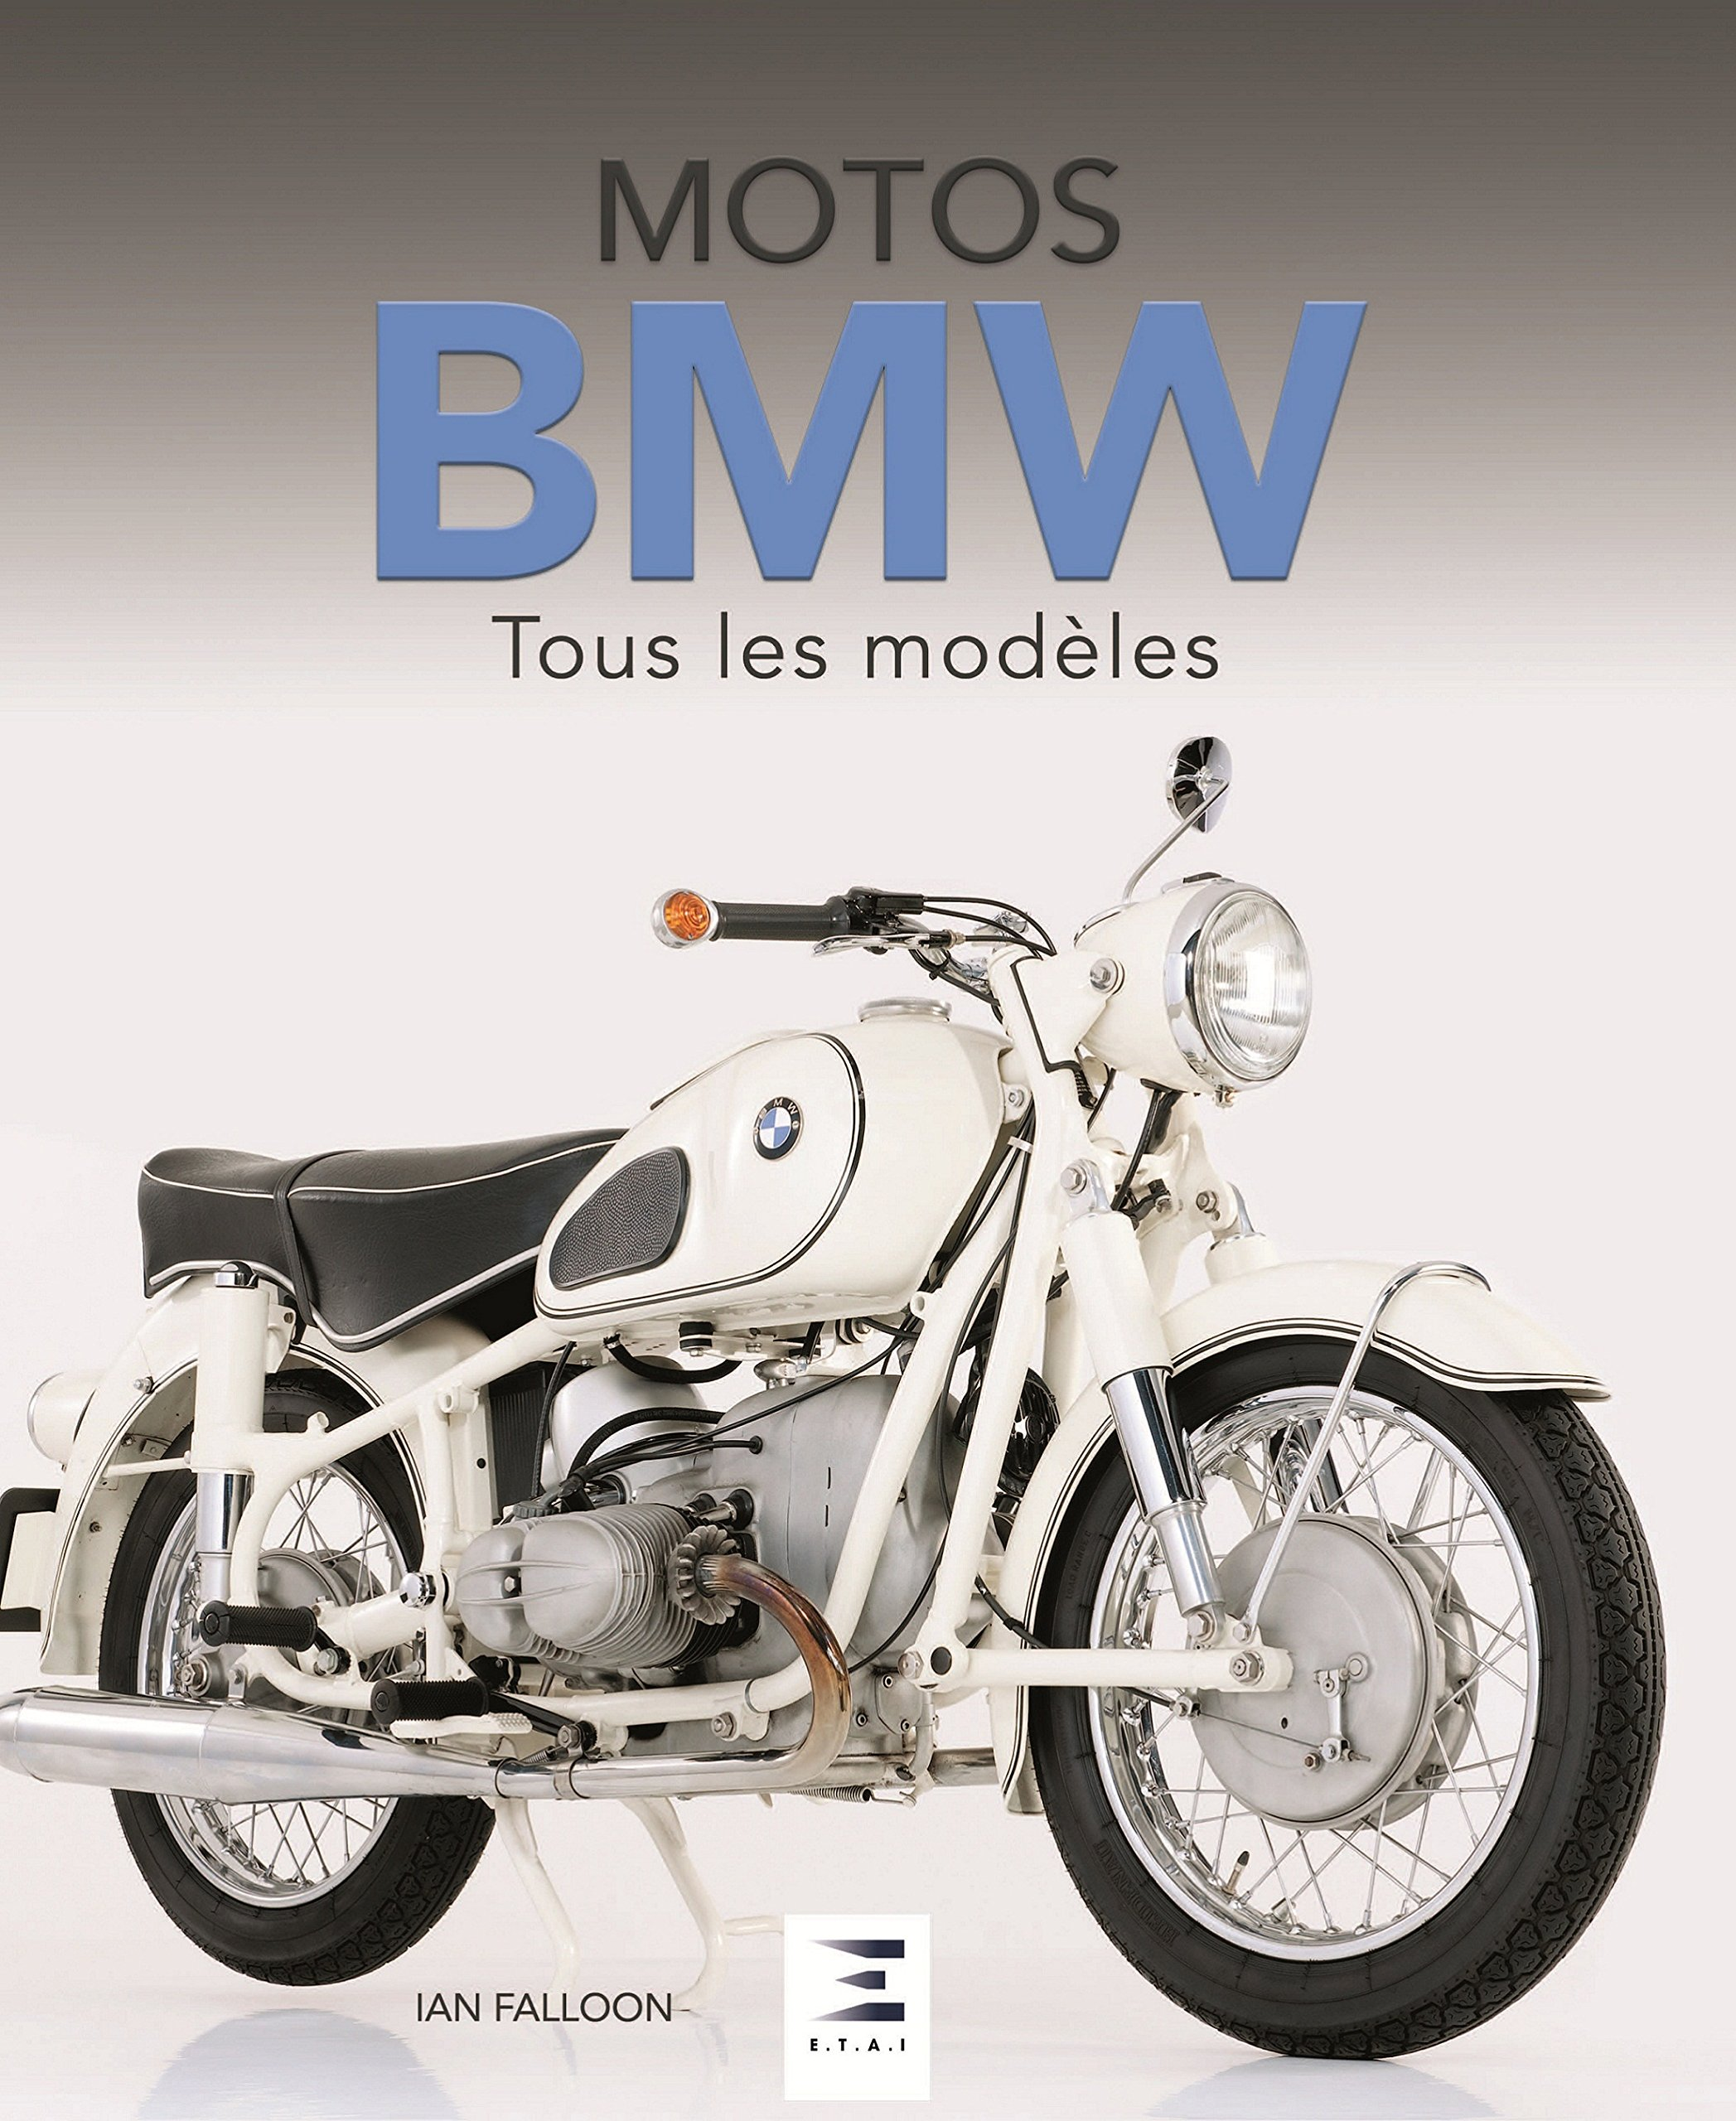 maison bmw moto maroc ventana blog. Black Bedroom Furniture Sets. Home Design Ideas